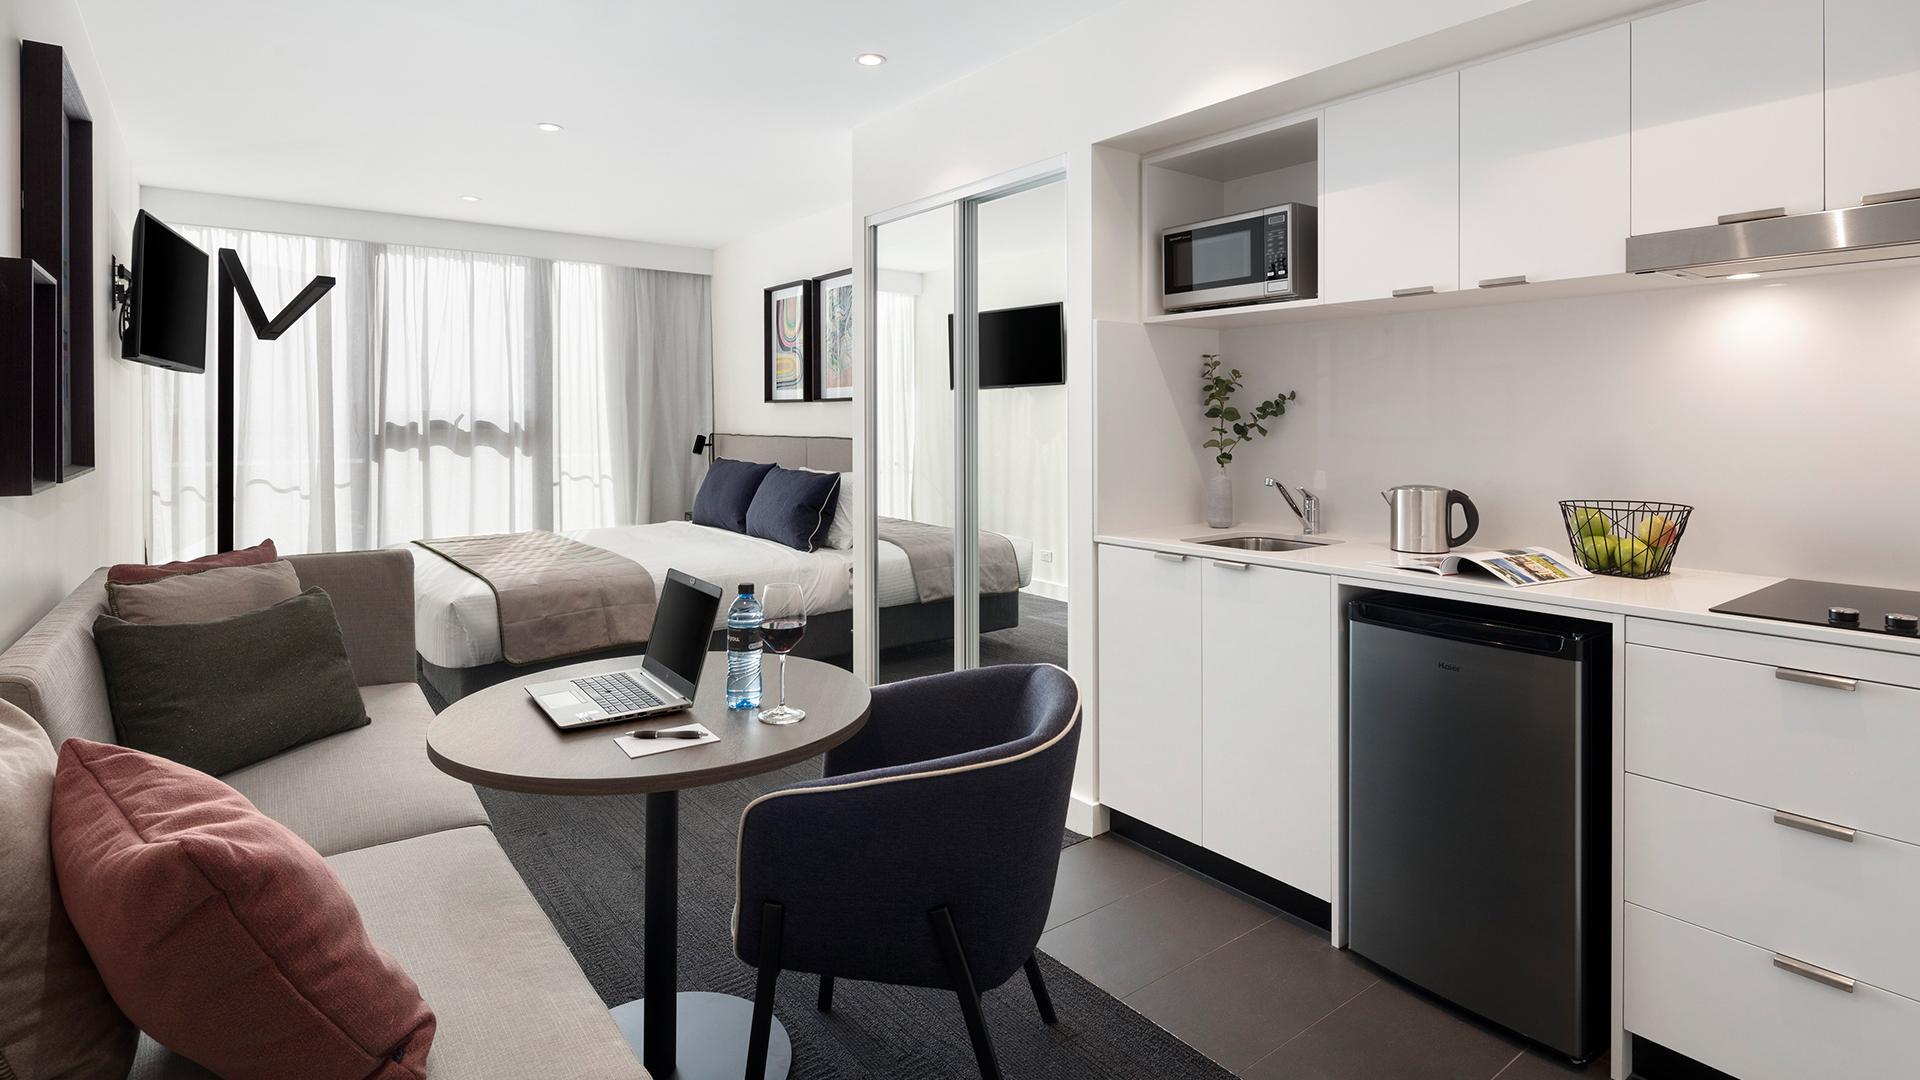 Studio Executive Apartment image 1 at Quest St Kilda Road by Port Phillip City, Victoria, Australia